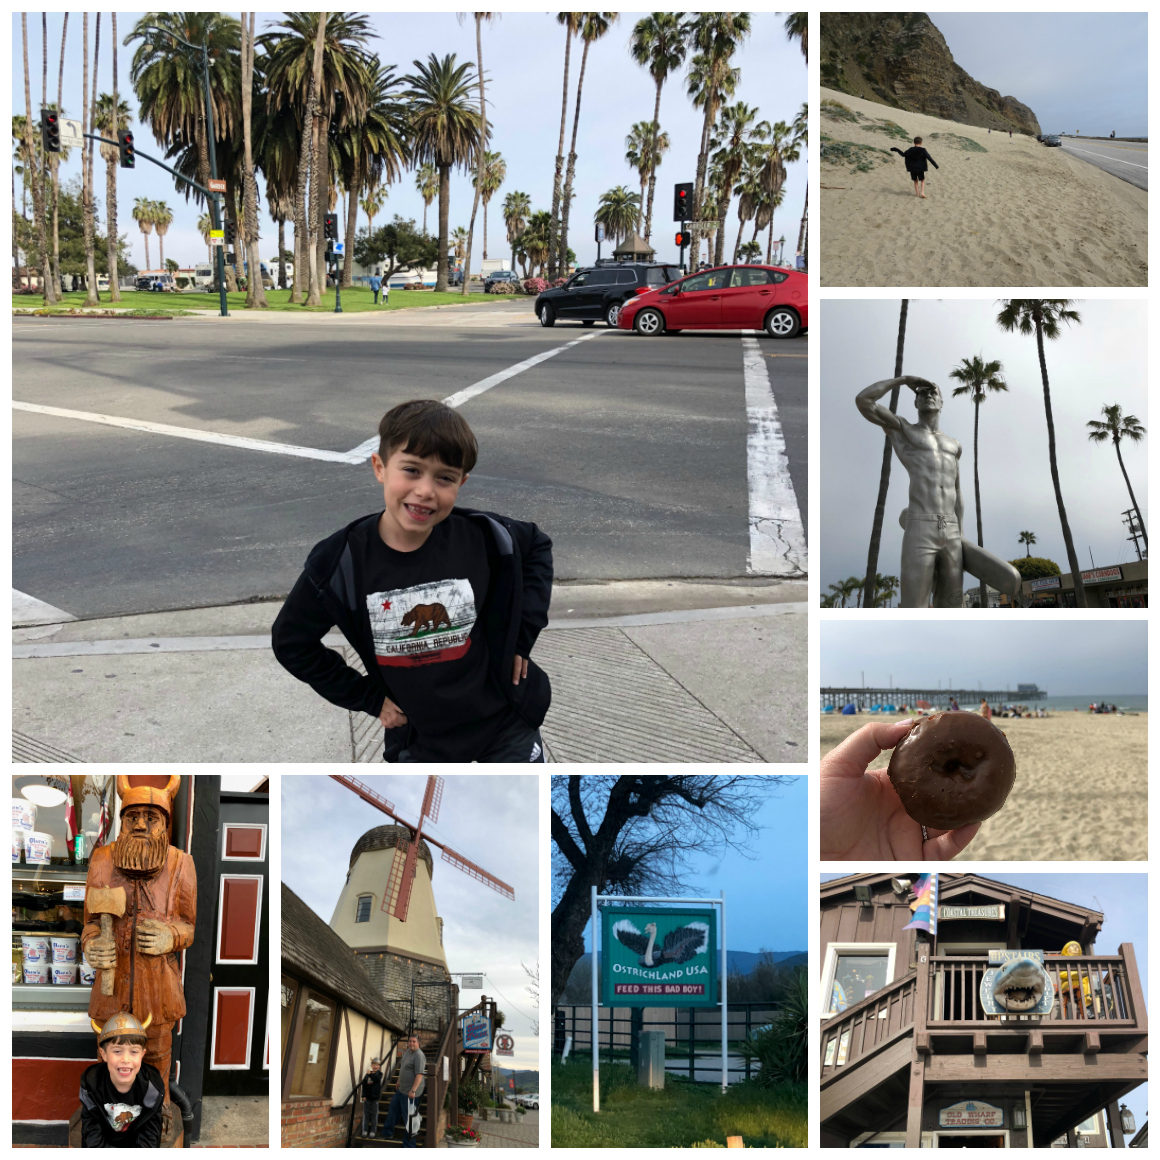 California road trip to Newport beach, Santa Barbara, and Solvang with kids